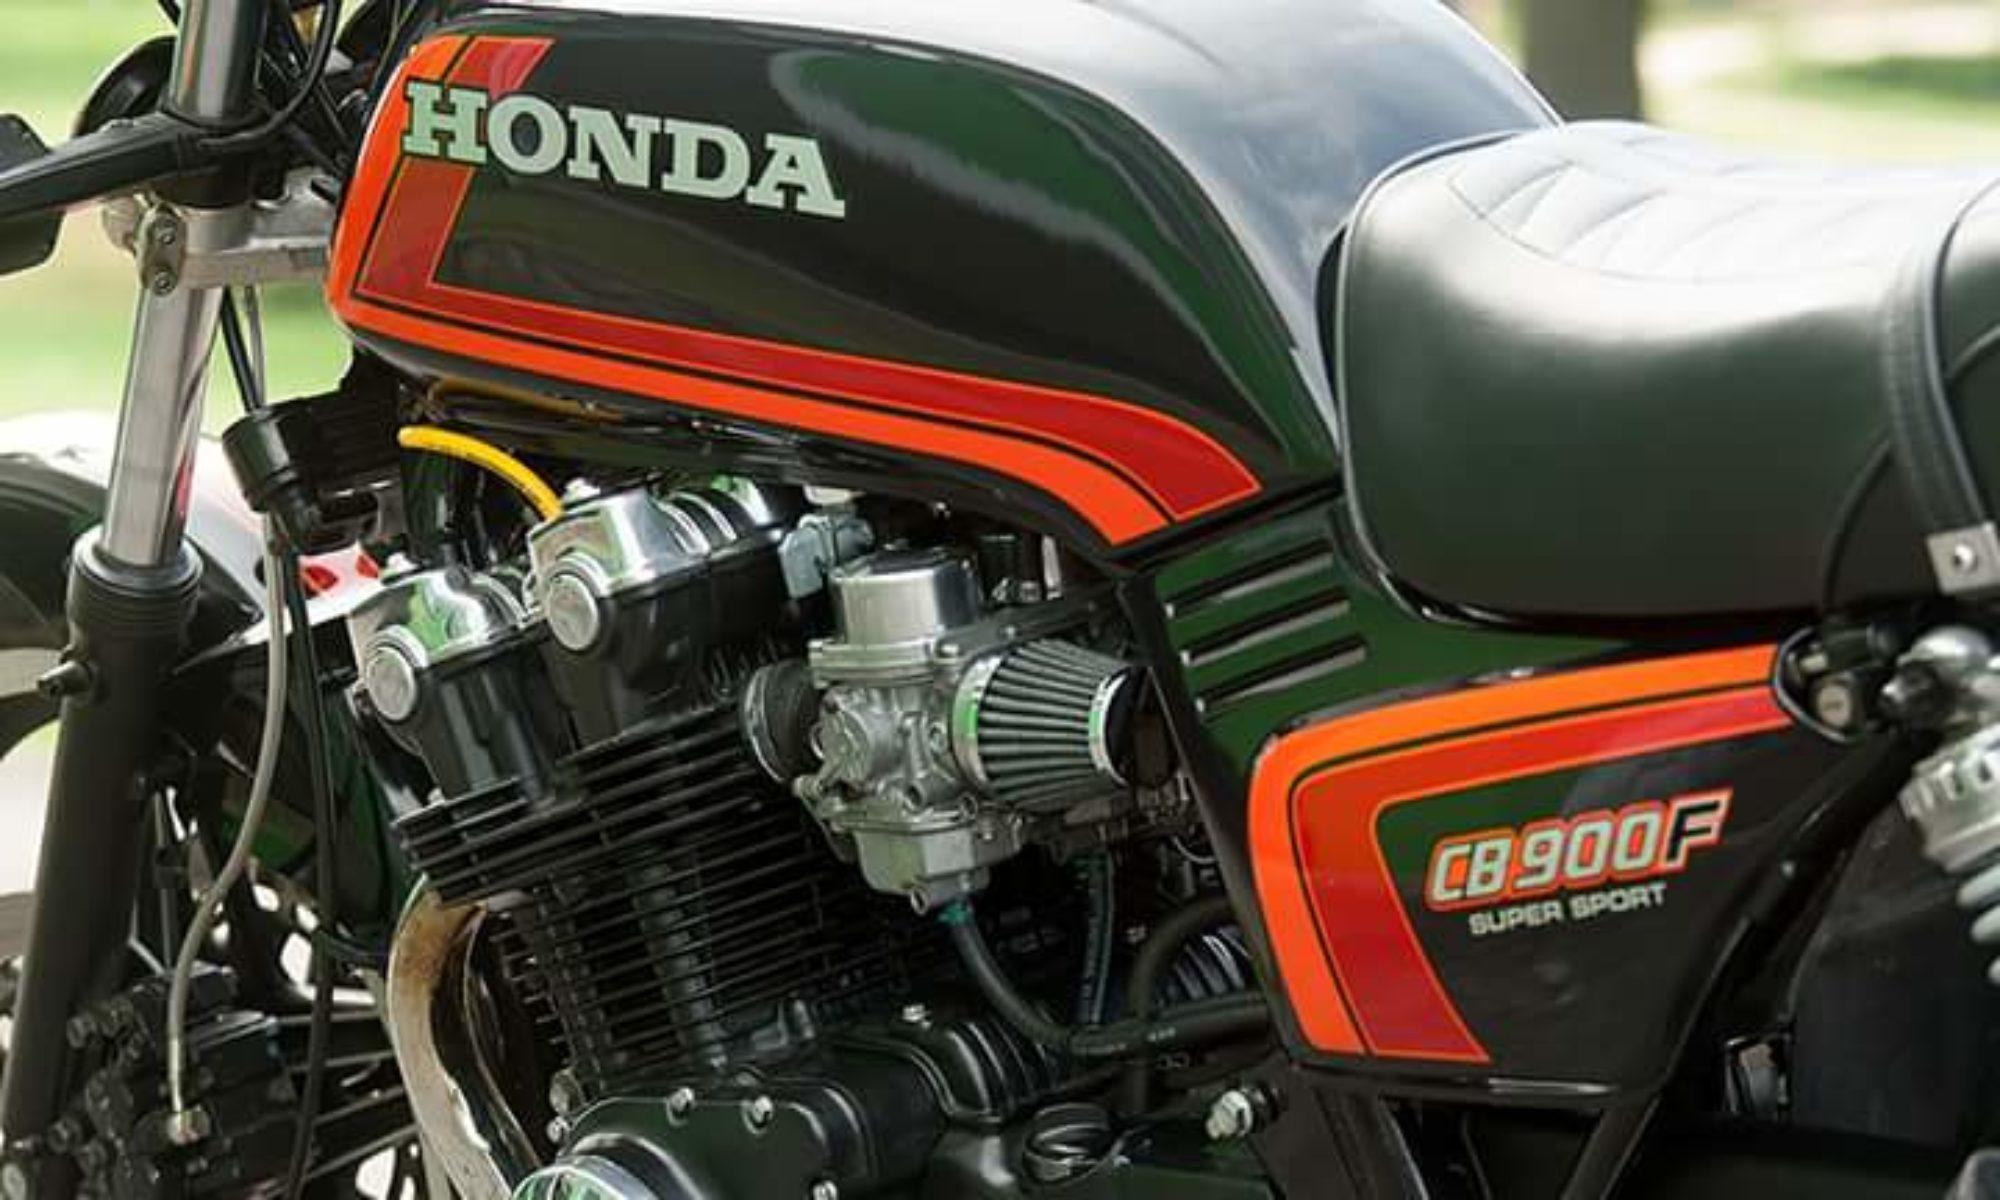 Gaston.Motorcycle.Werks (704)675-5393